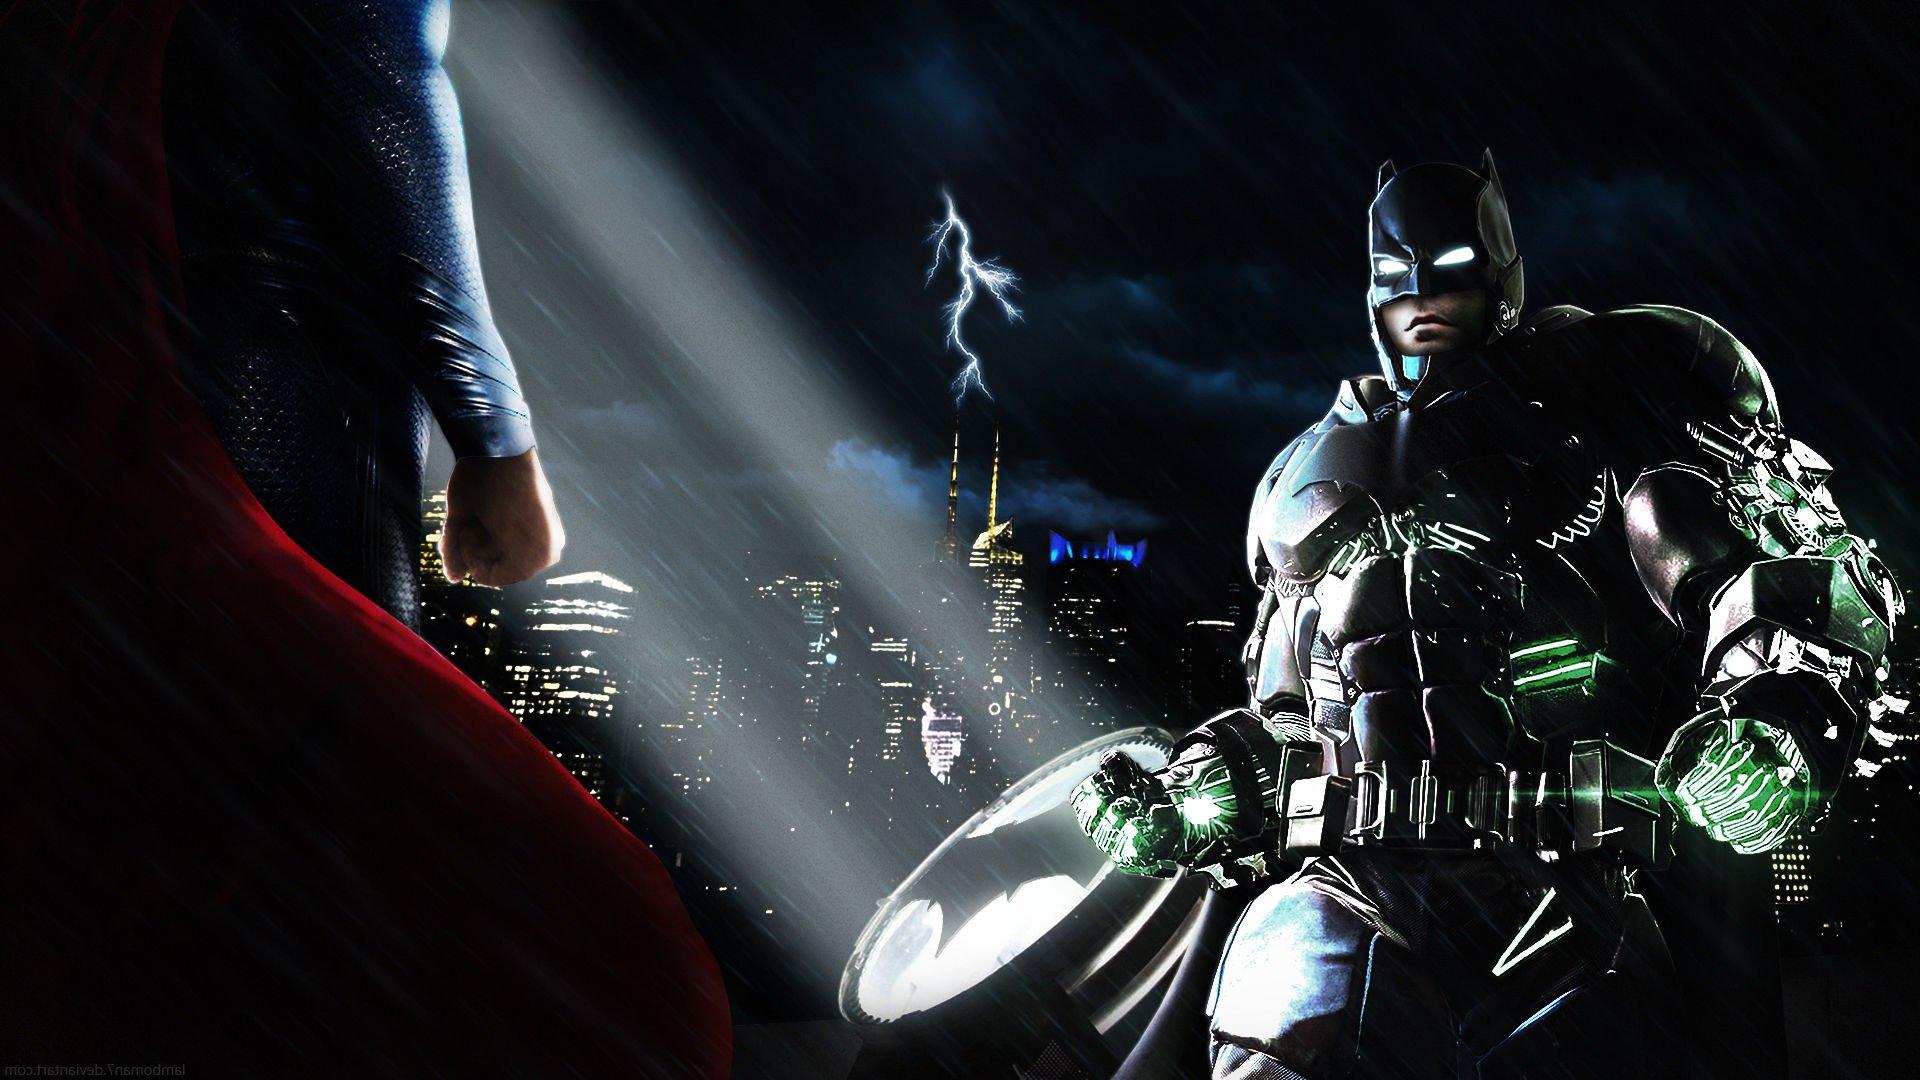 SUPERMAN adventure action batman superman dawn justice wallpaper 1920x1080